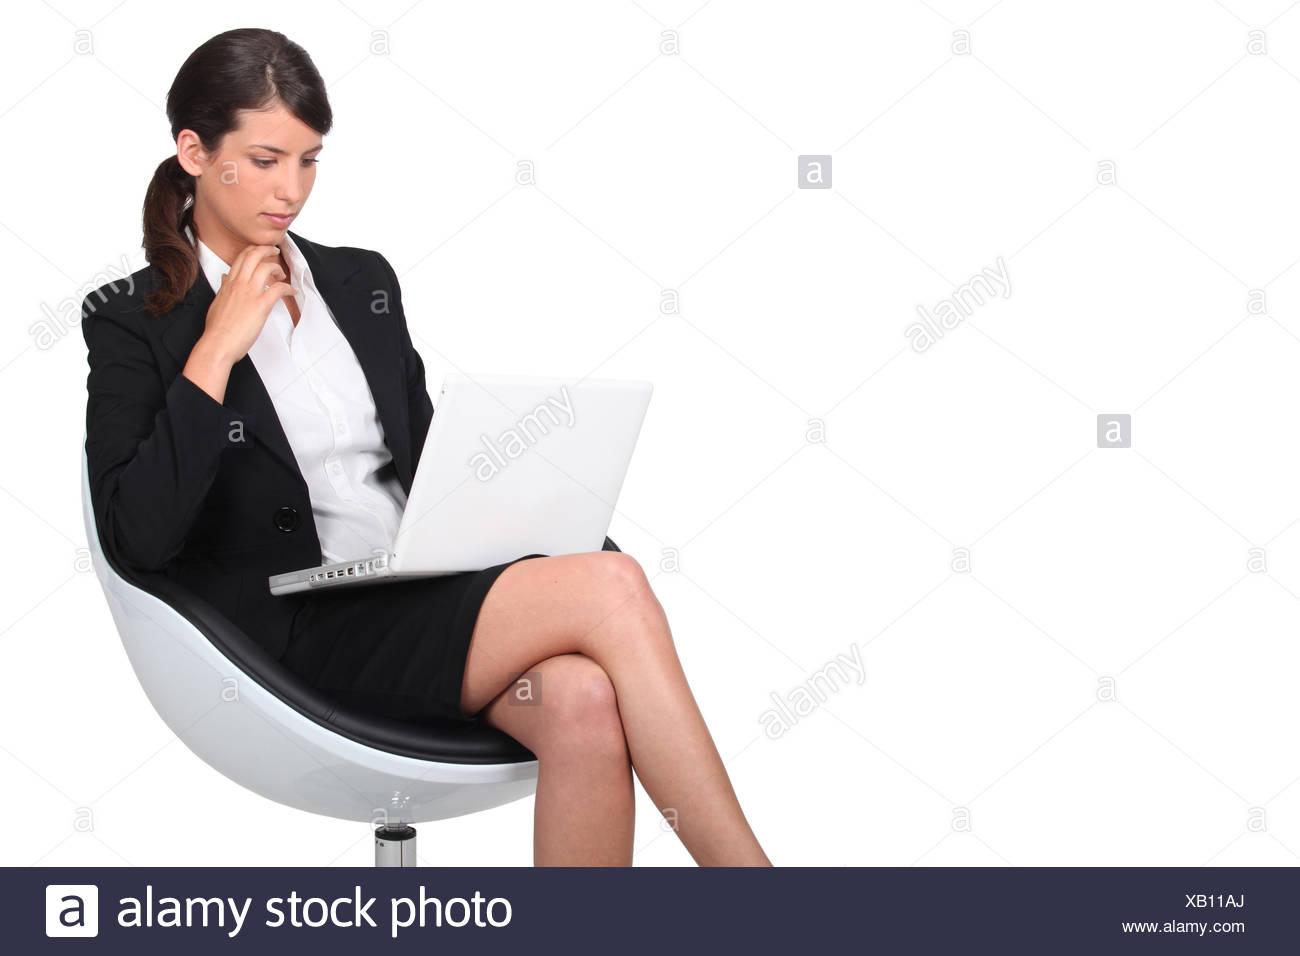 Zwei reife Frauen im Büro